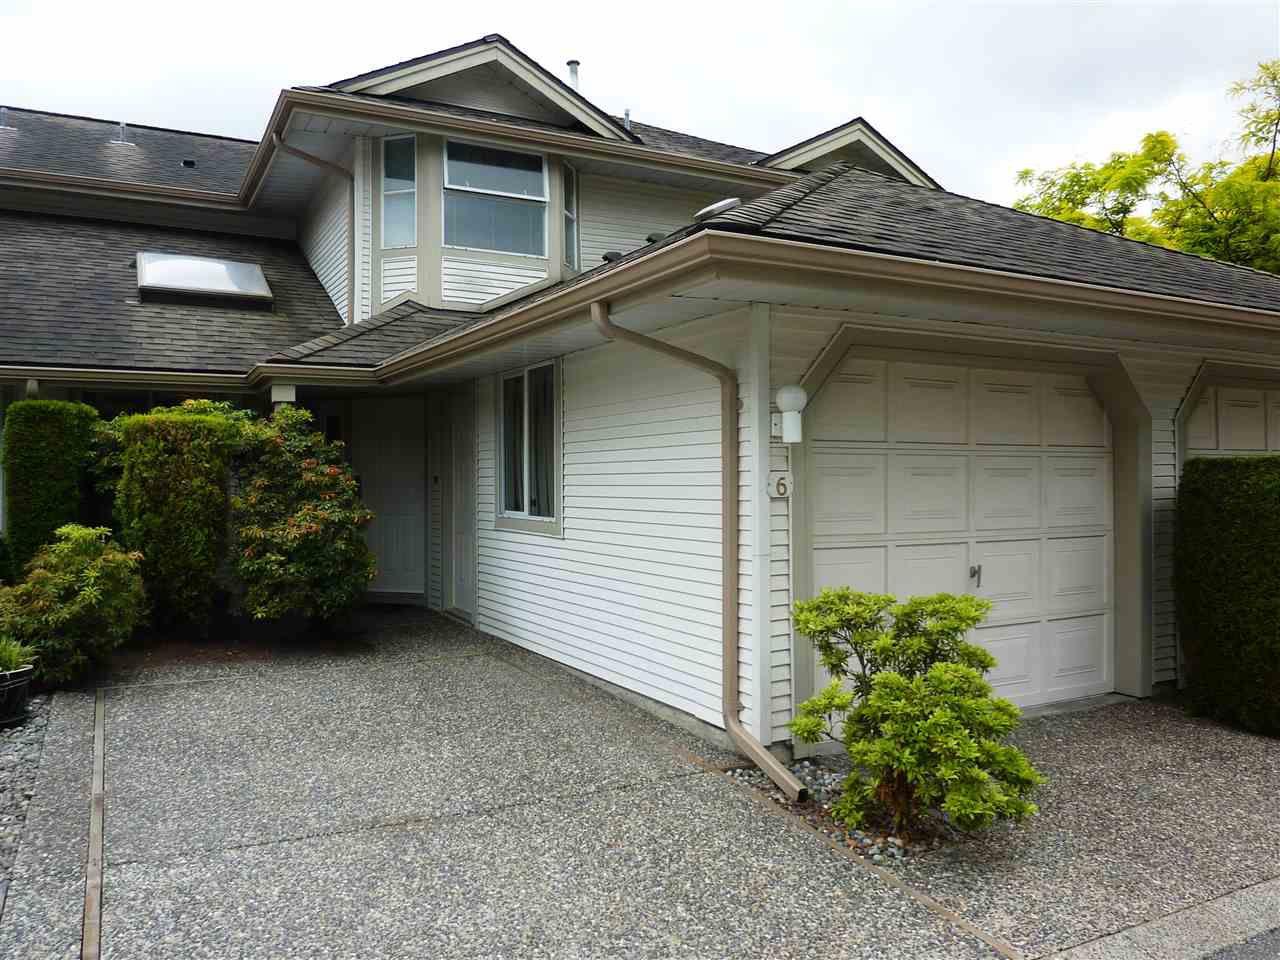 Main Photo: 6 9045 WALNUT GROVE DRIVE in Langley: Walnut Grove Townhouse for sale : MLS®# R2273288